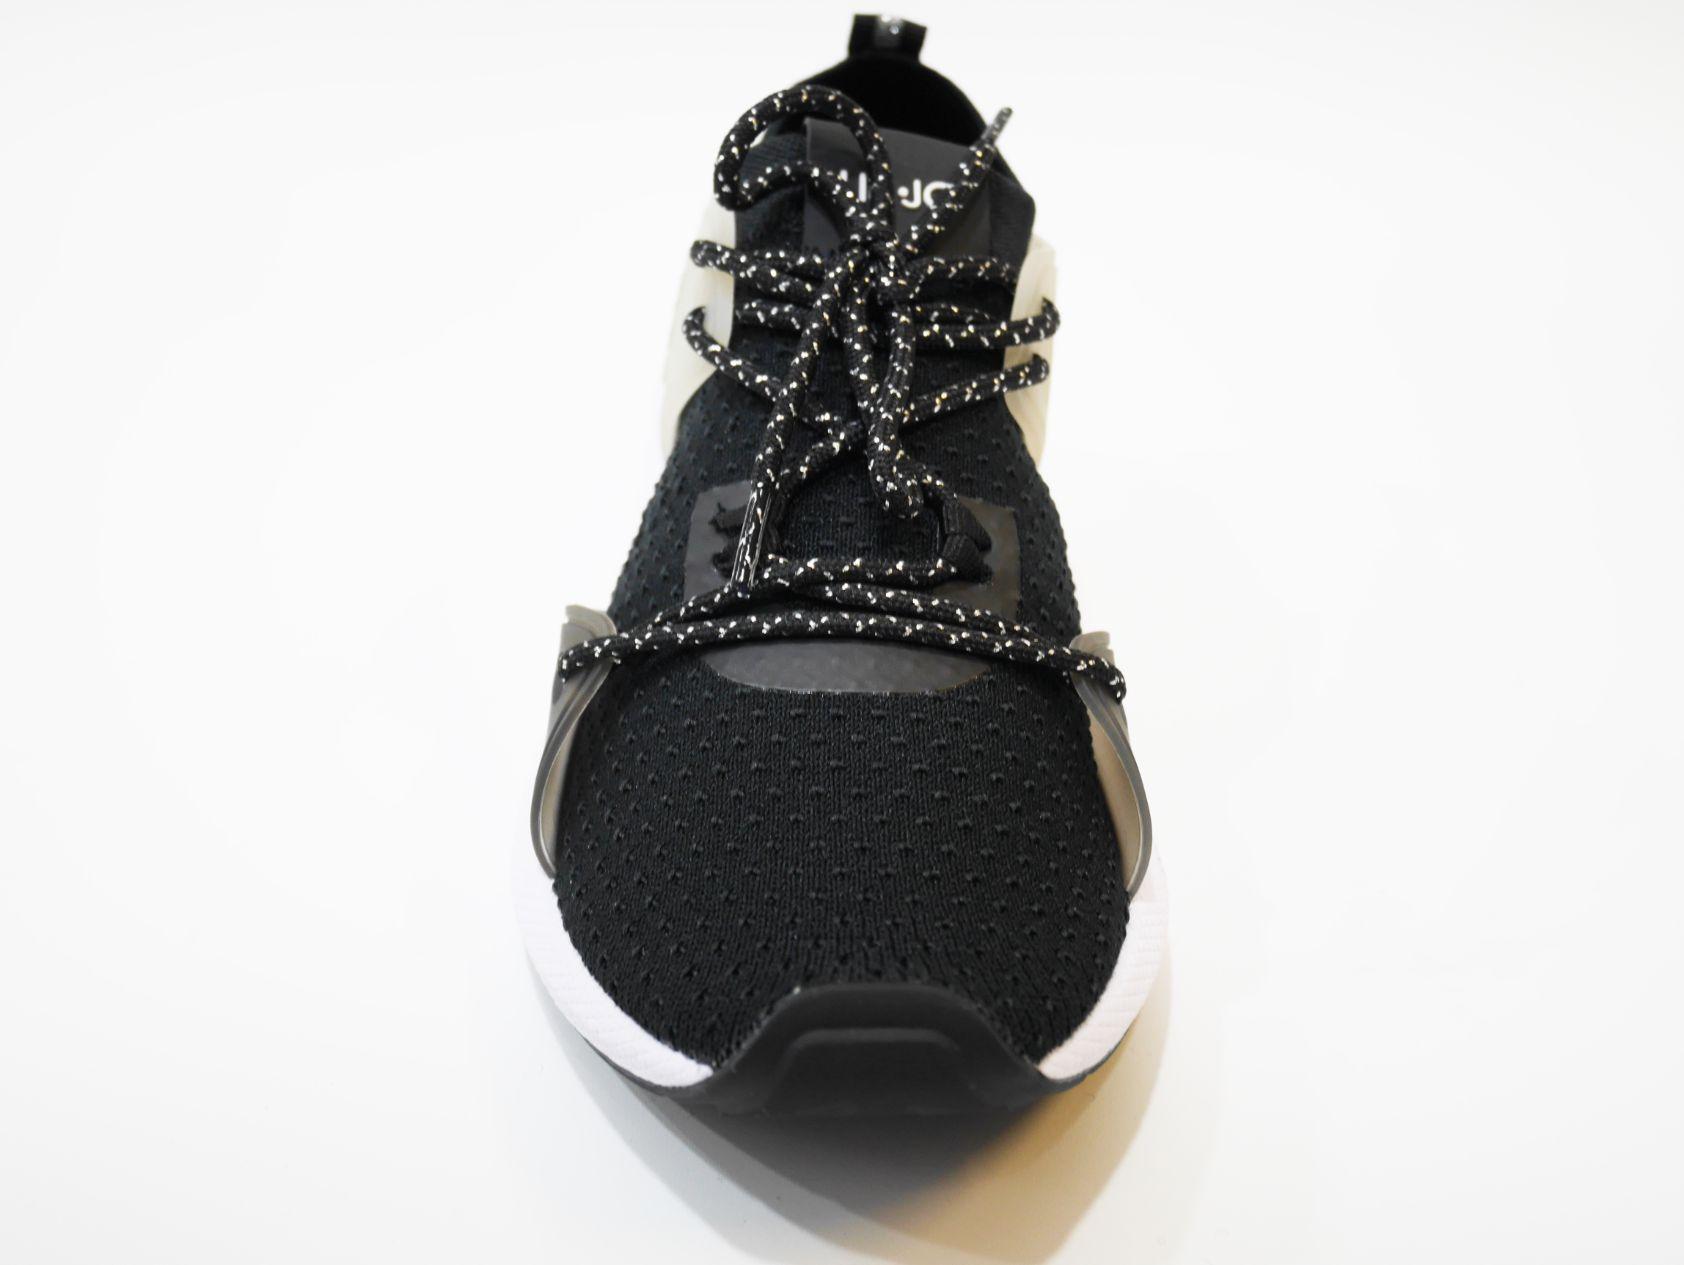 B69045 TX022 YULIA 01 SNEAKER BLACKRED 2